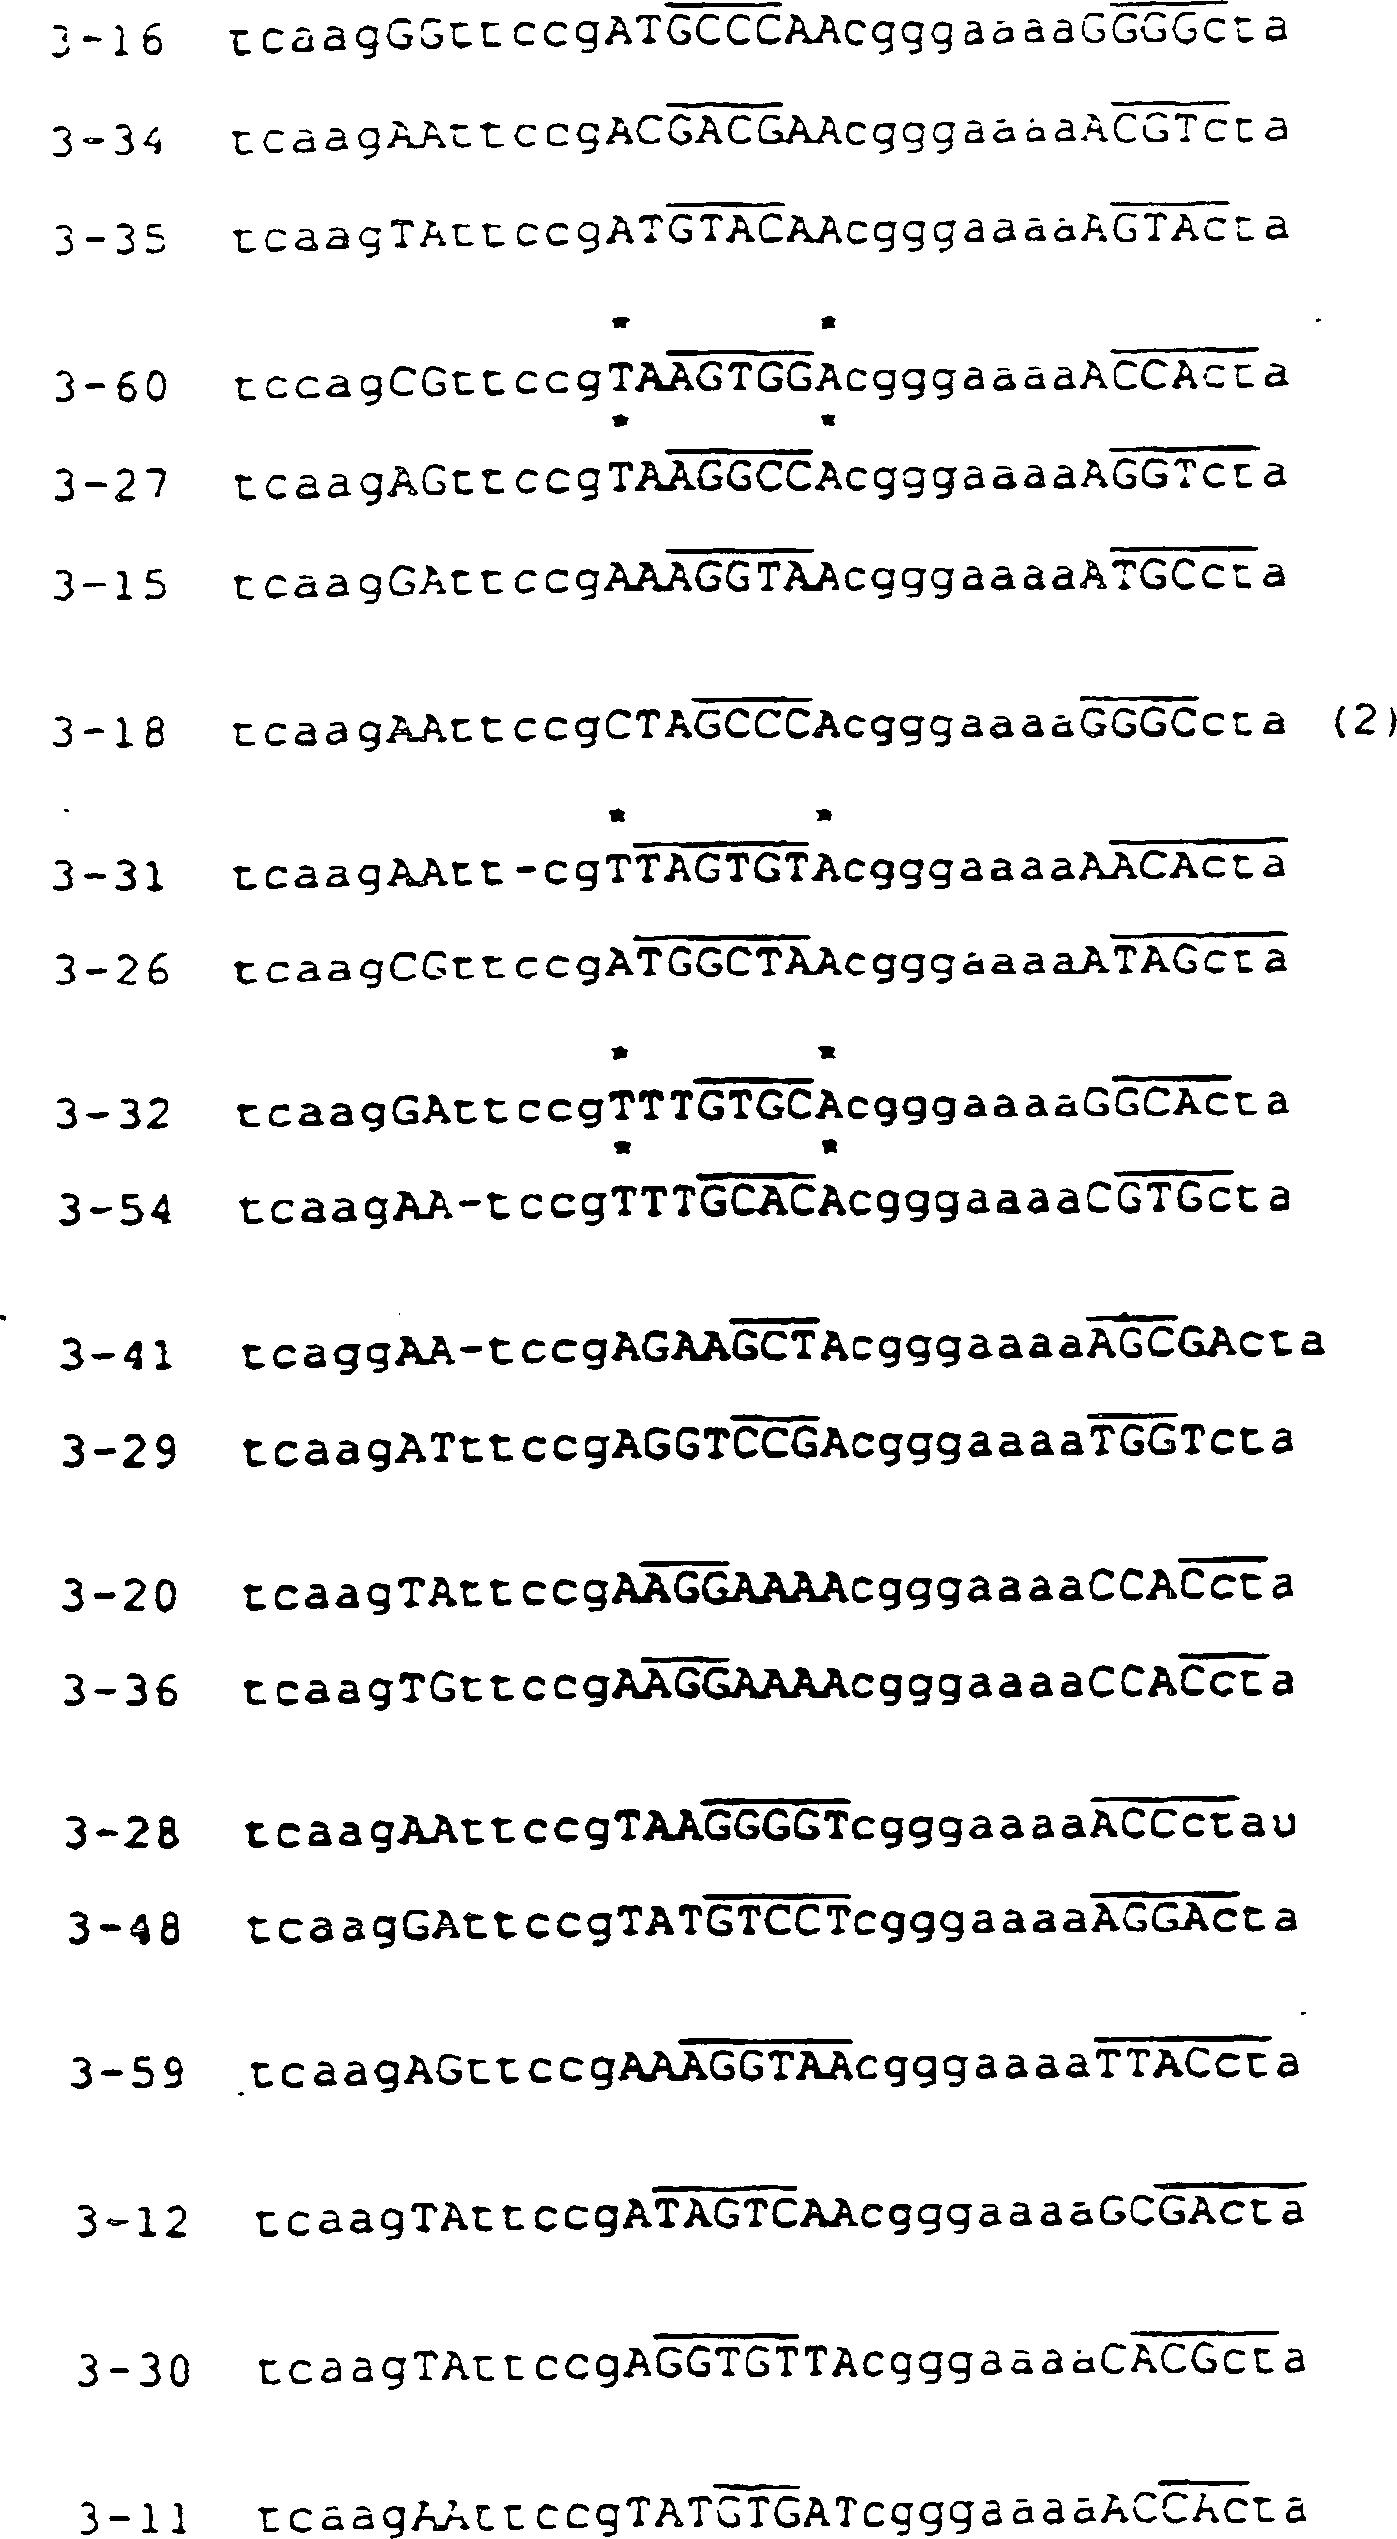 DE69133513T2 - A method for use of nucleic acid ligands